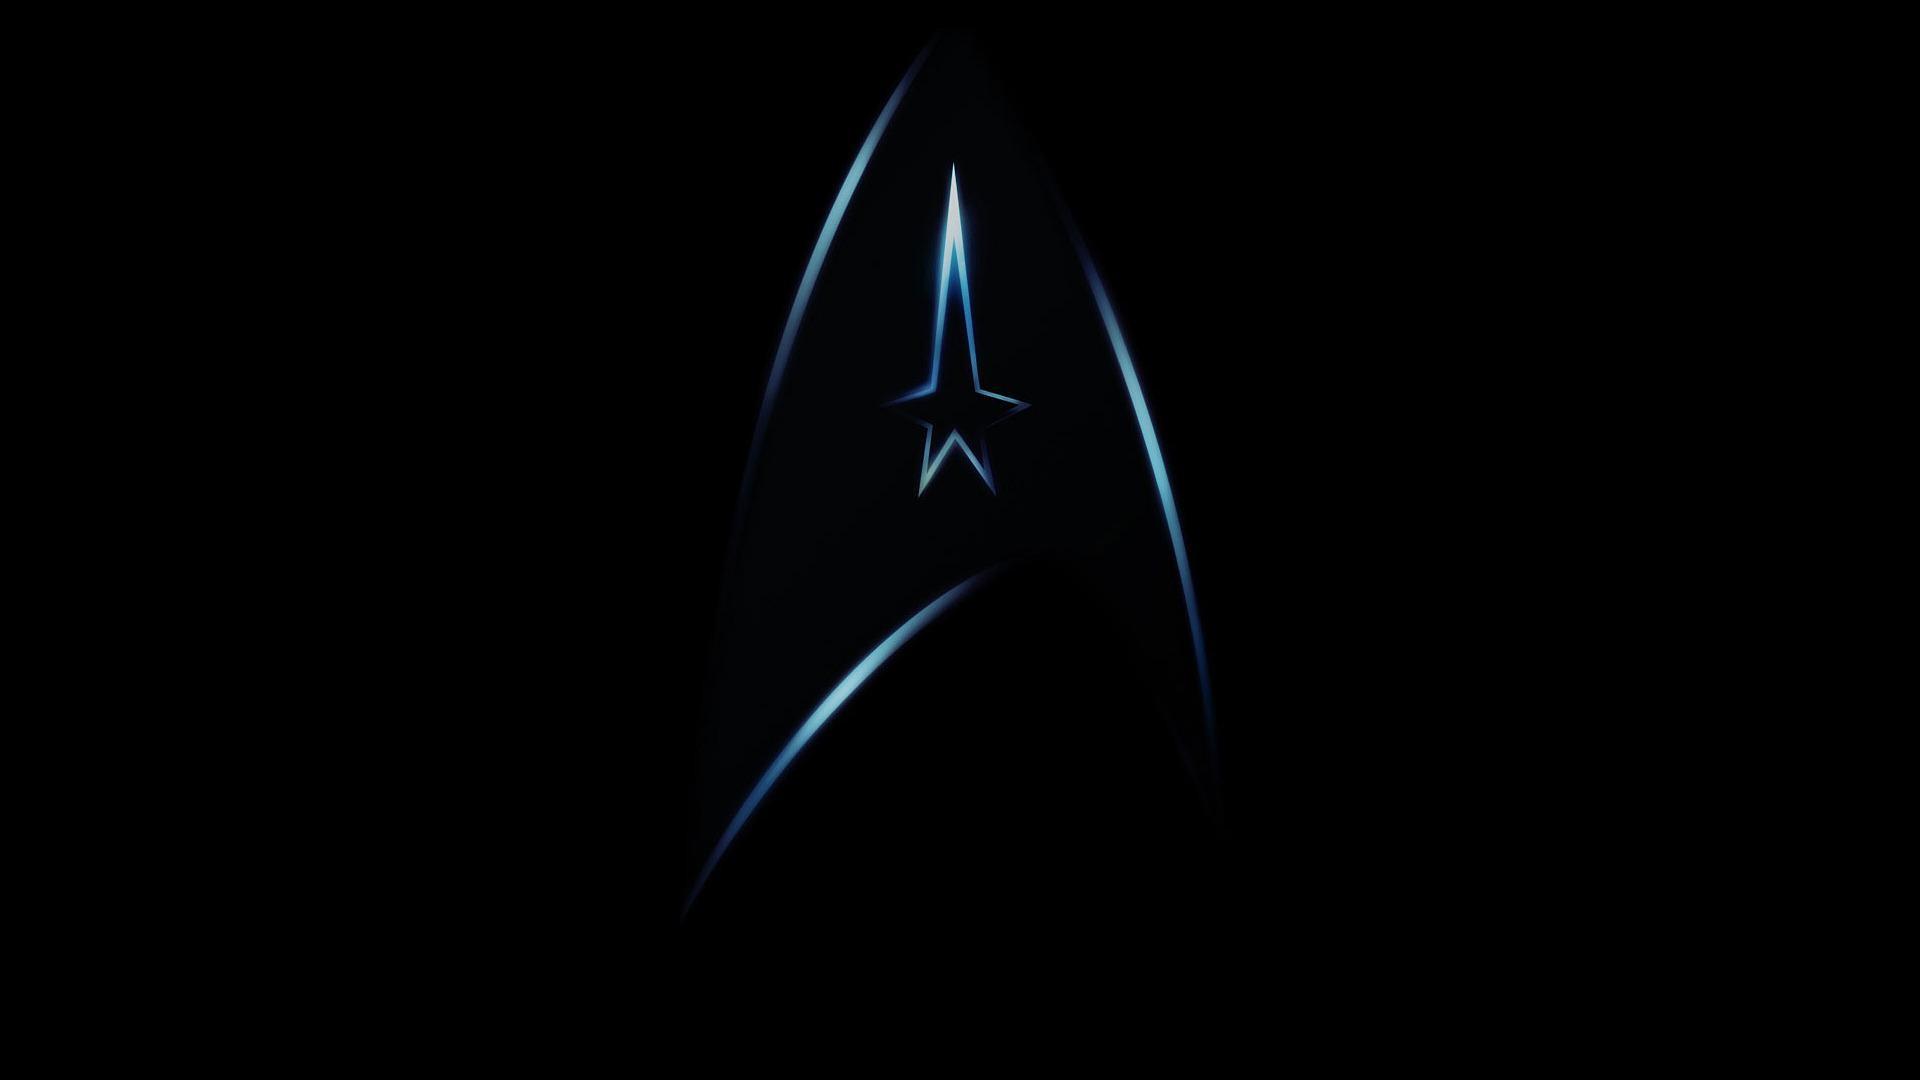 Trek star wallpaper logos wallpapers – 1196267